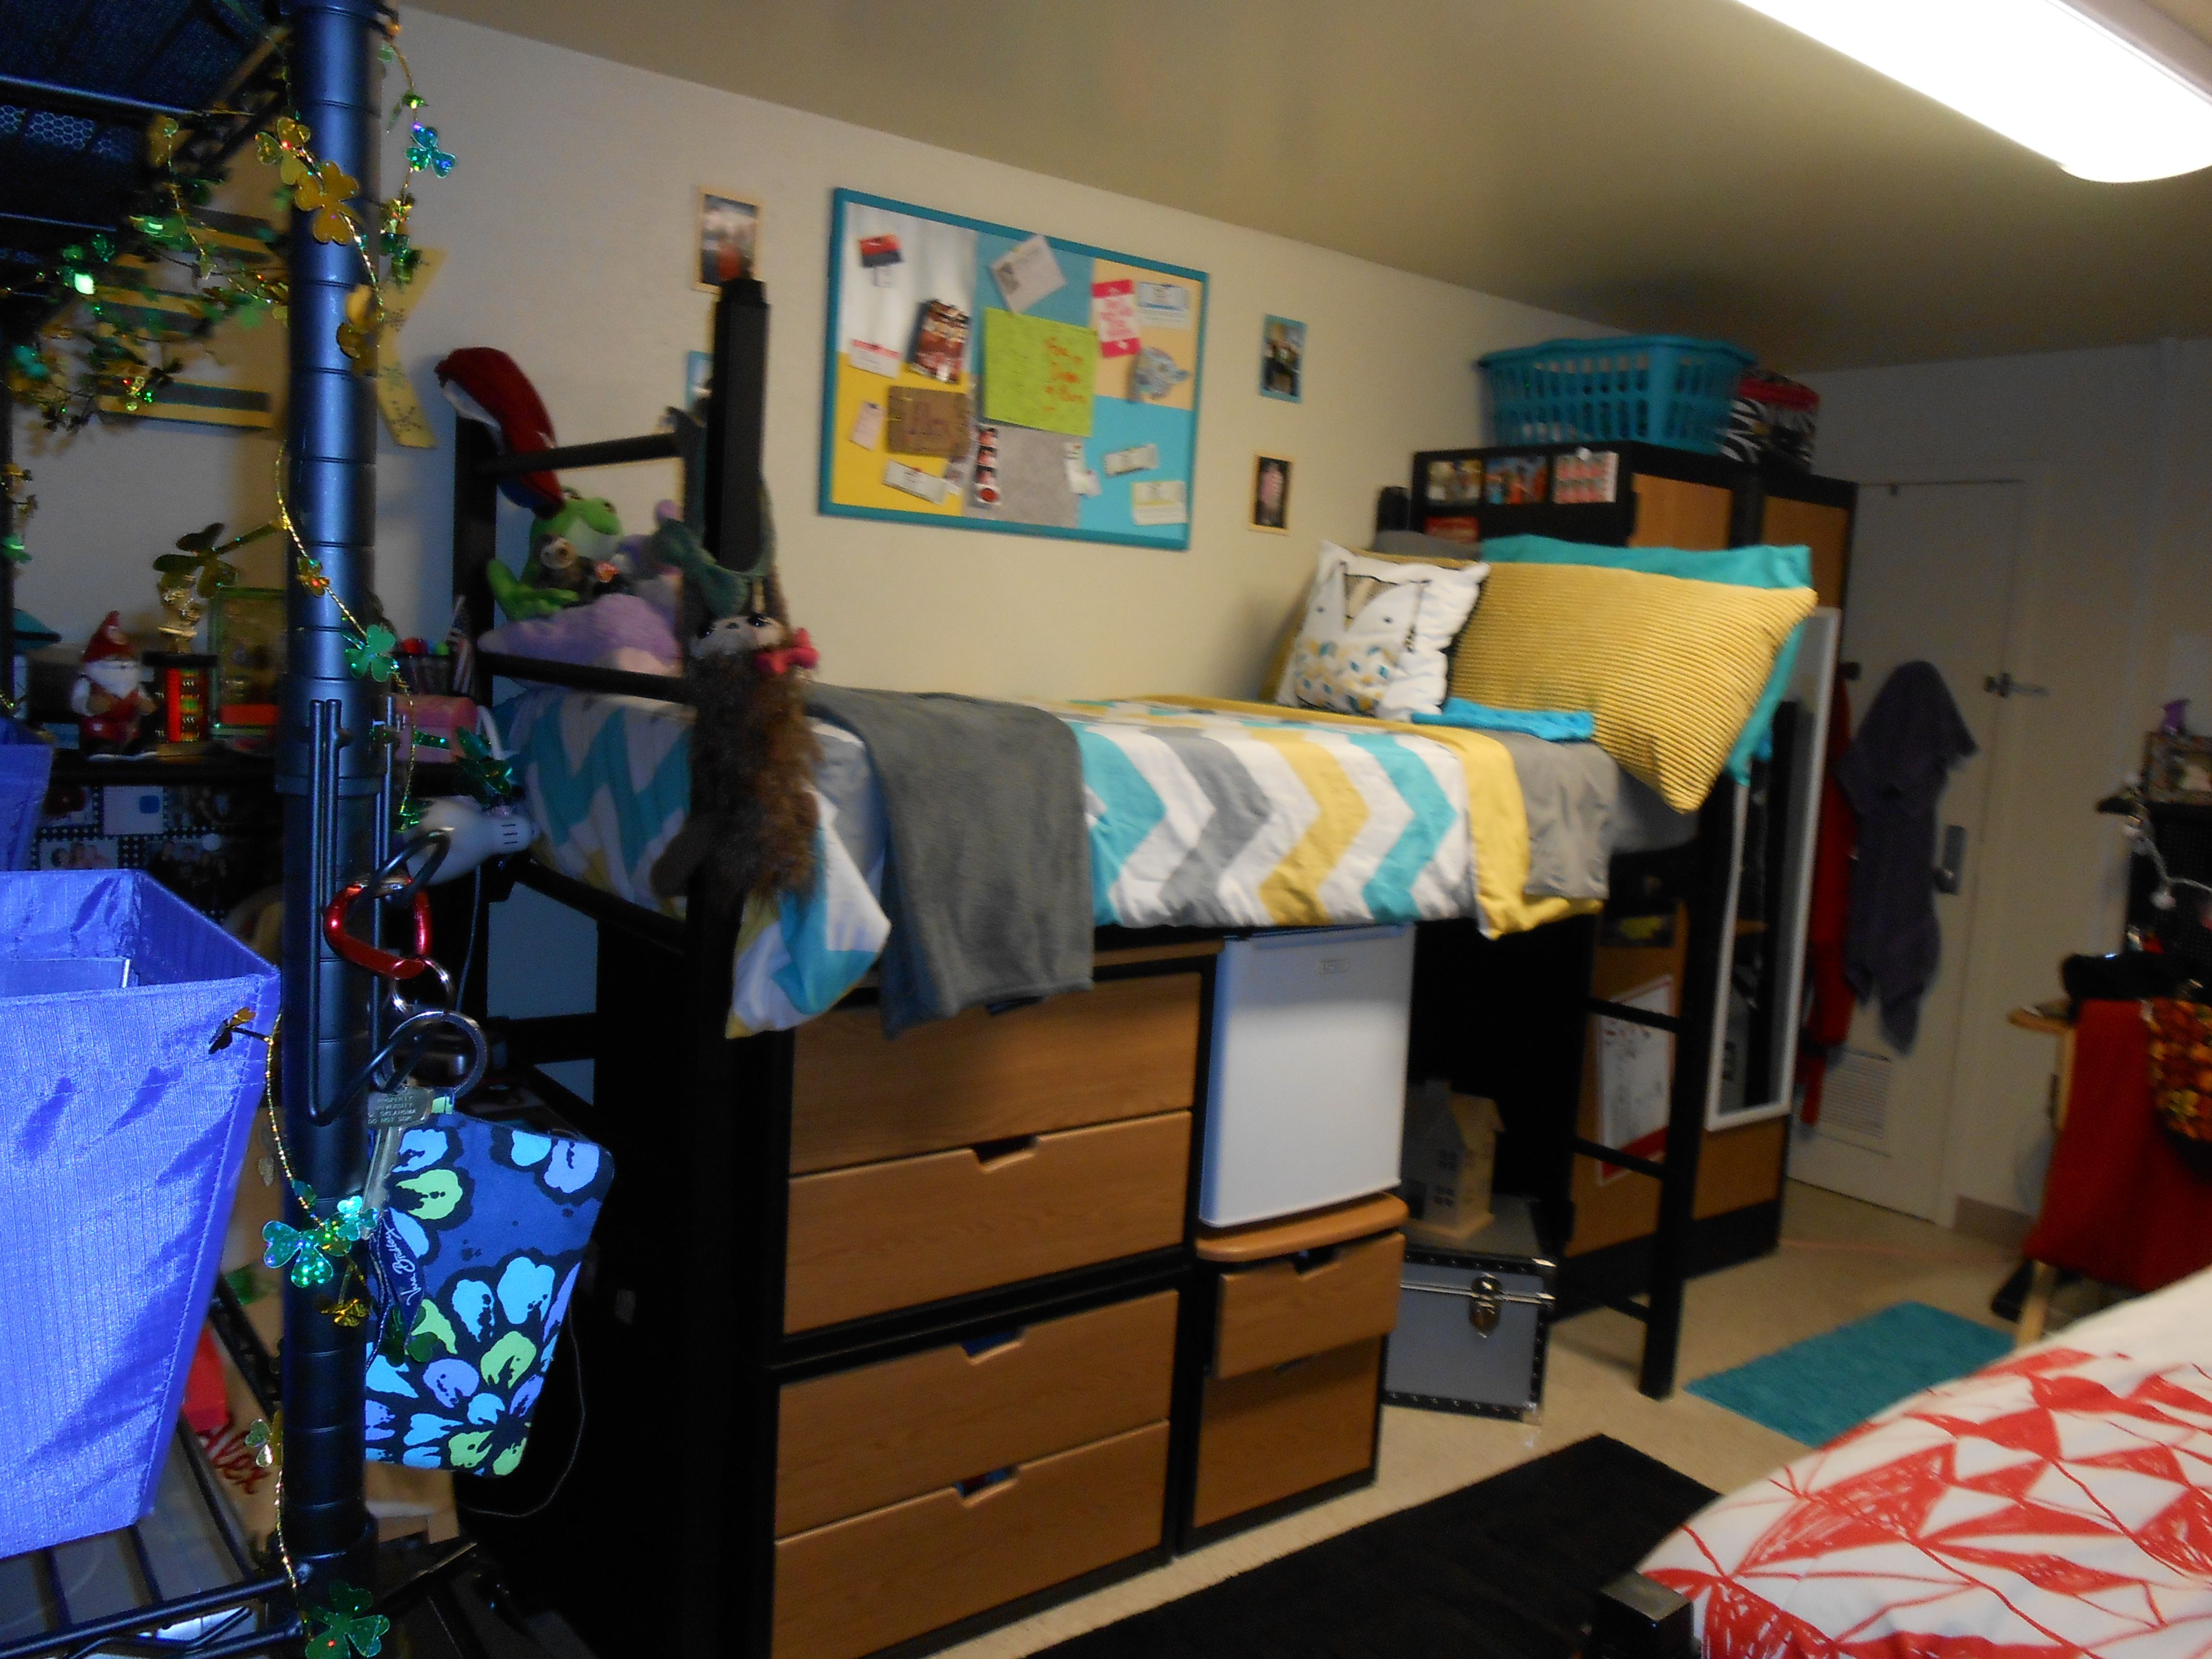 Dorm Room At The University Of Oklahoma In 2019 Dorm